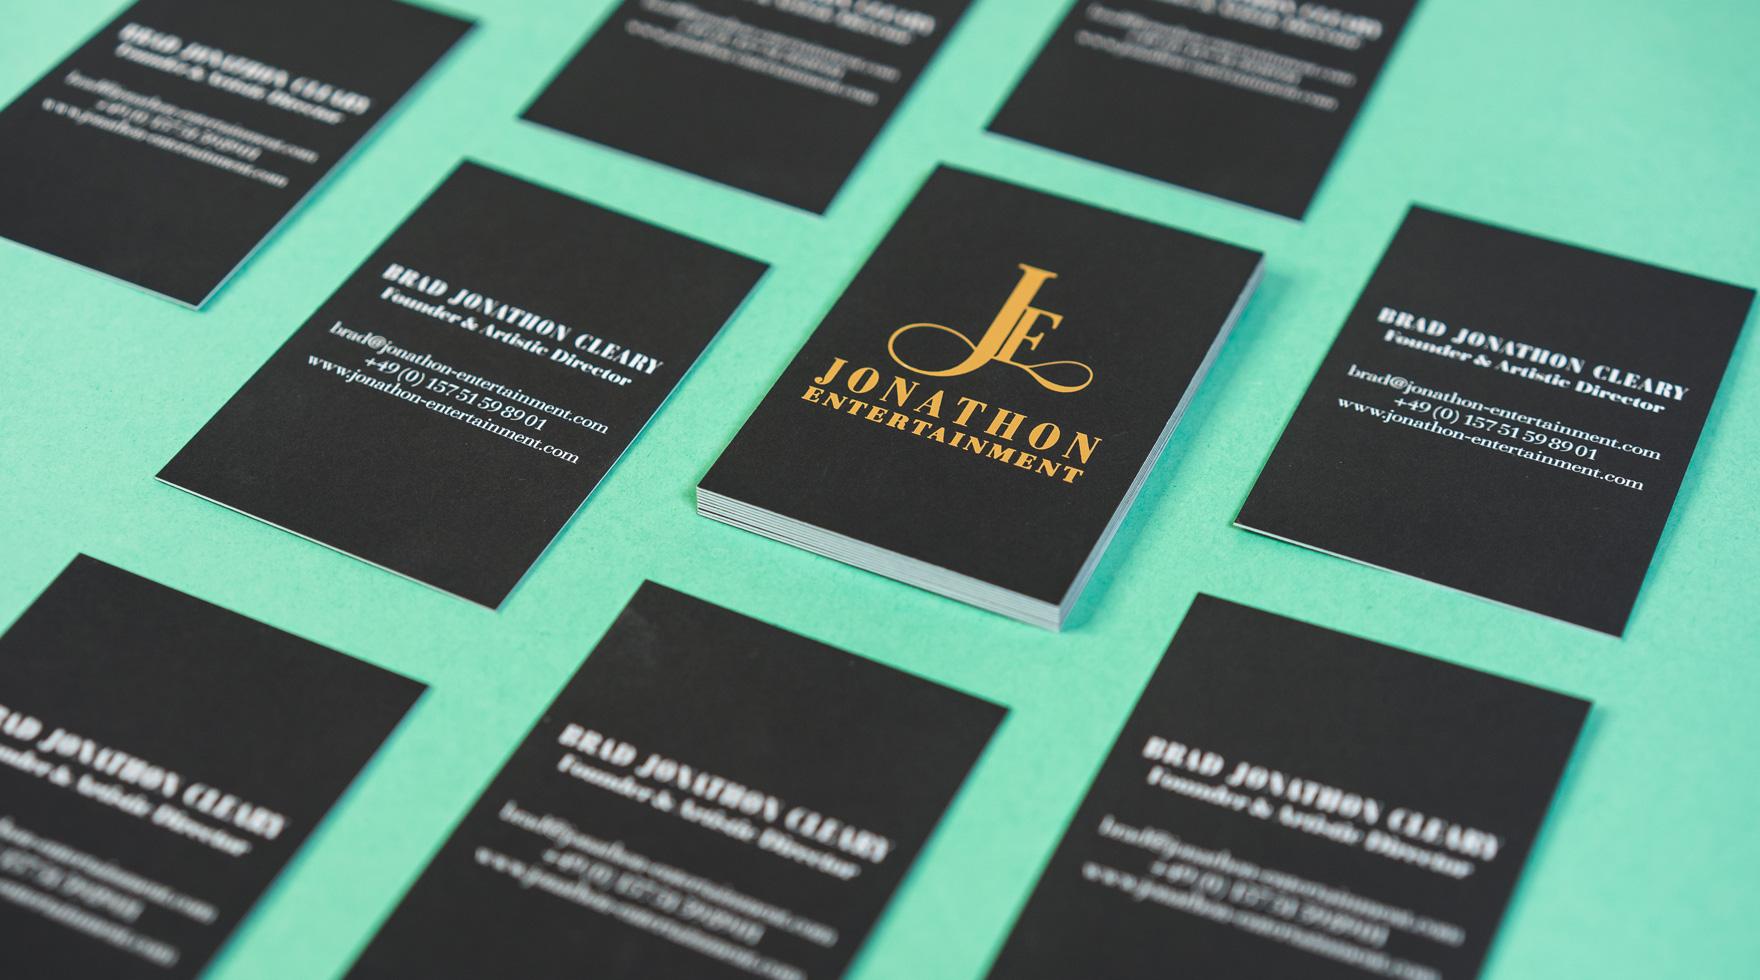 Visitenkarten-design-jonathon-entertainment-agentur-berlin